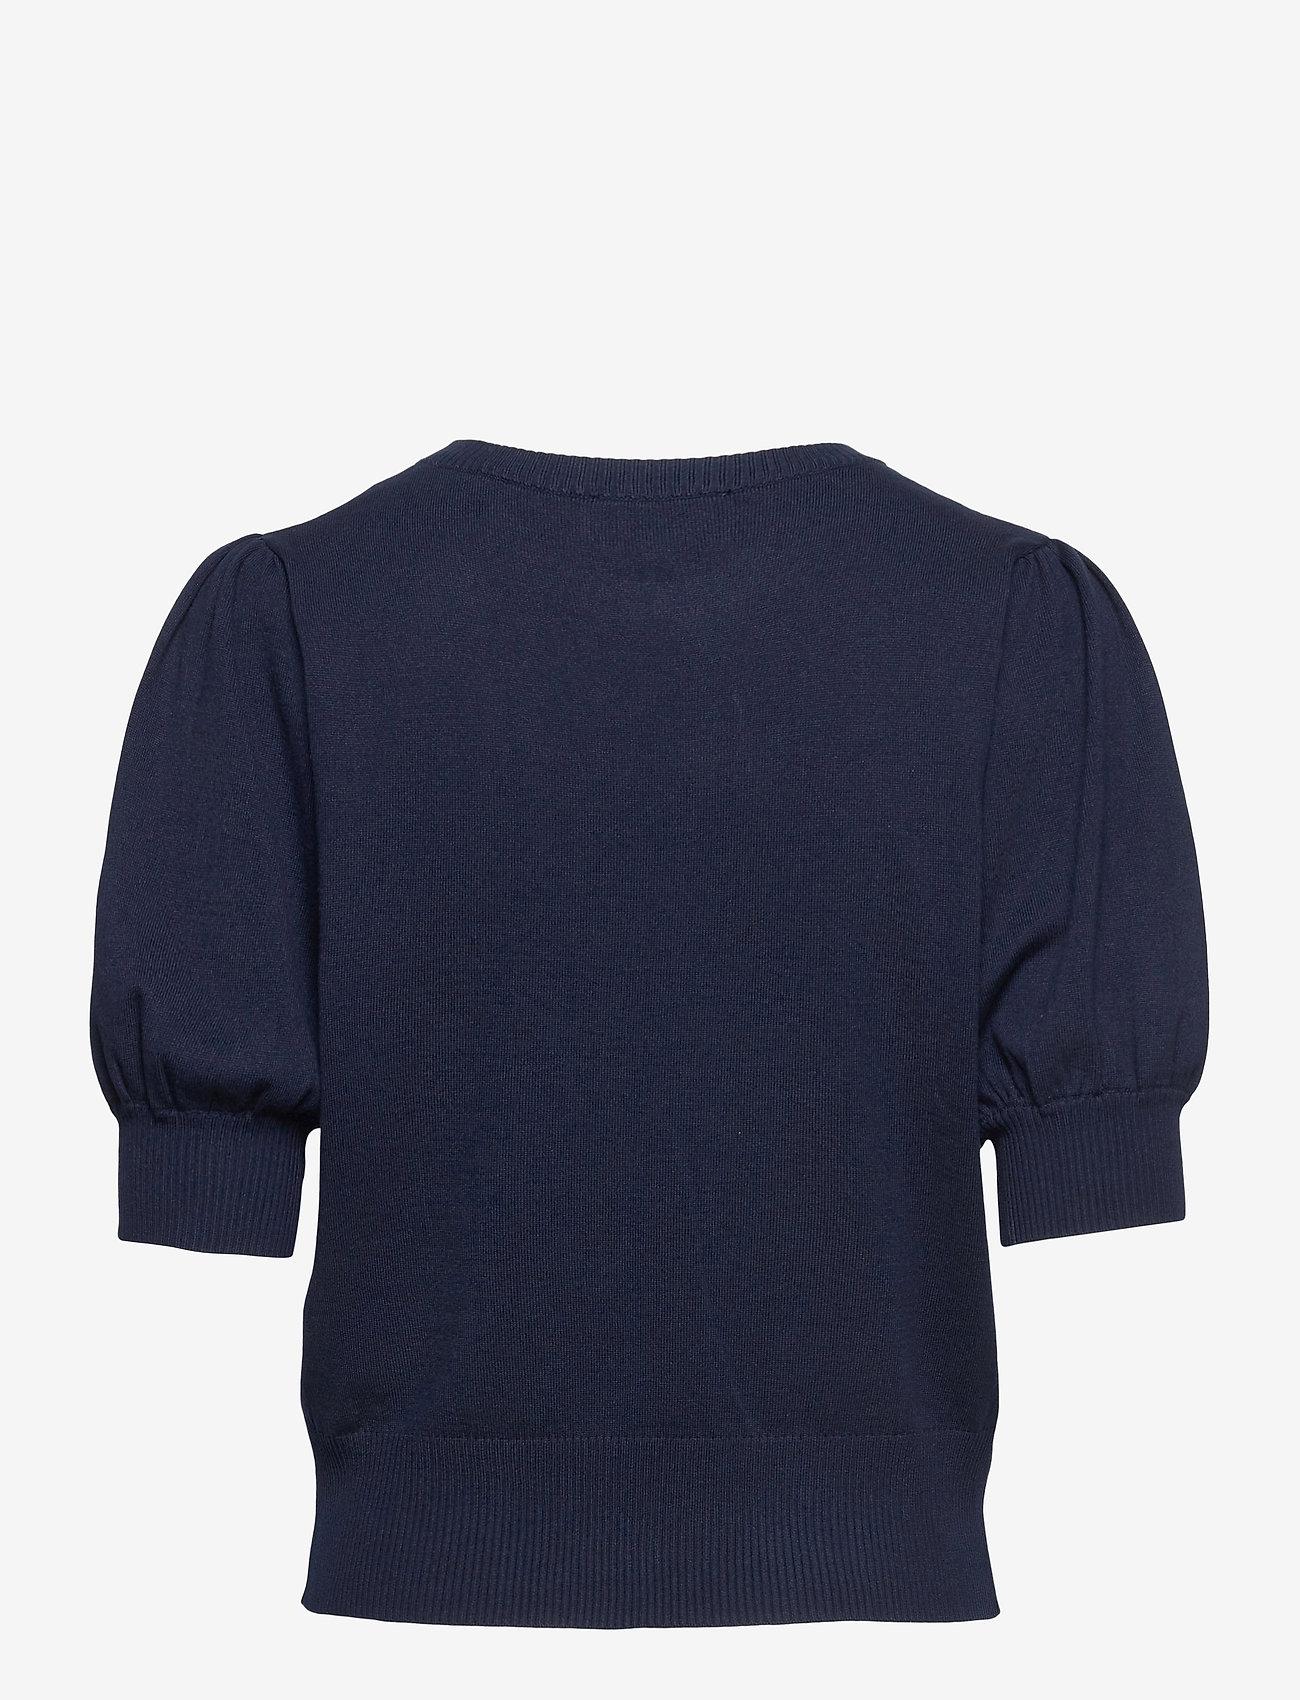 Minus - Liva knit tee - strikkede toppe - black iris solid - 1